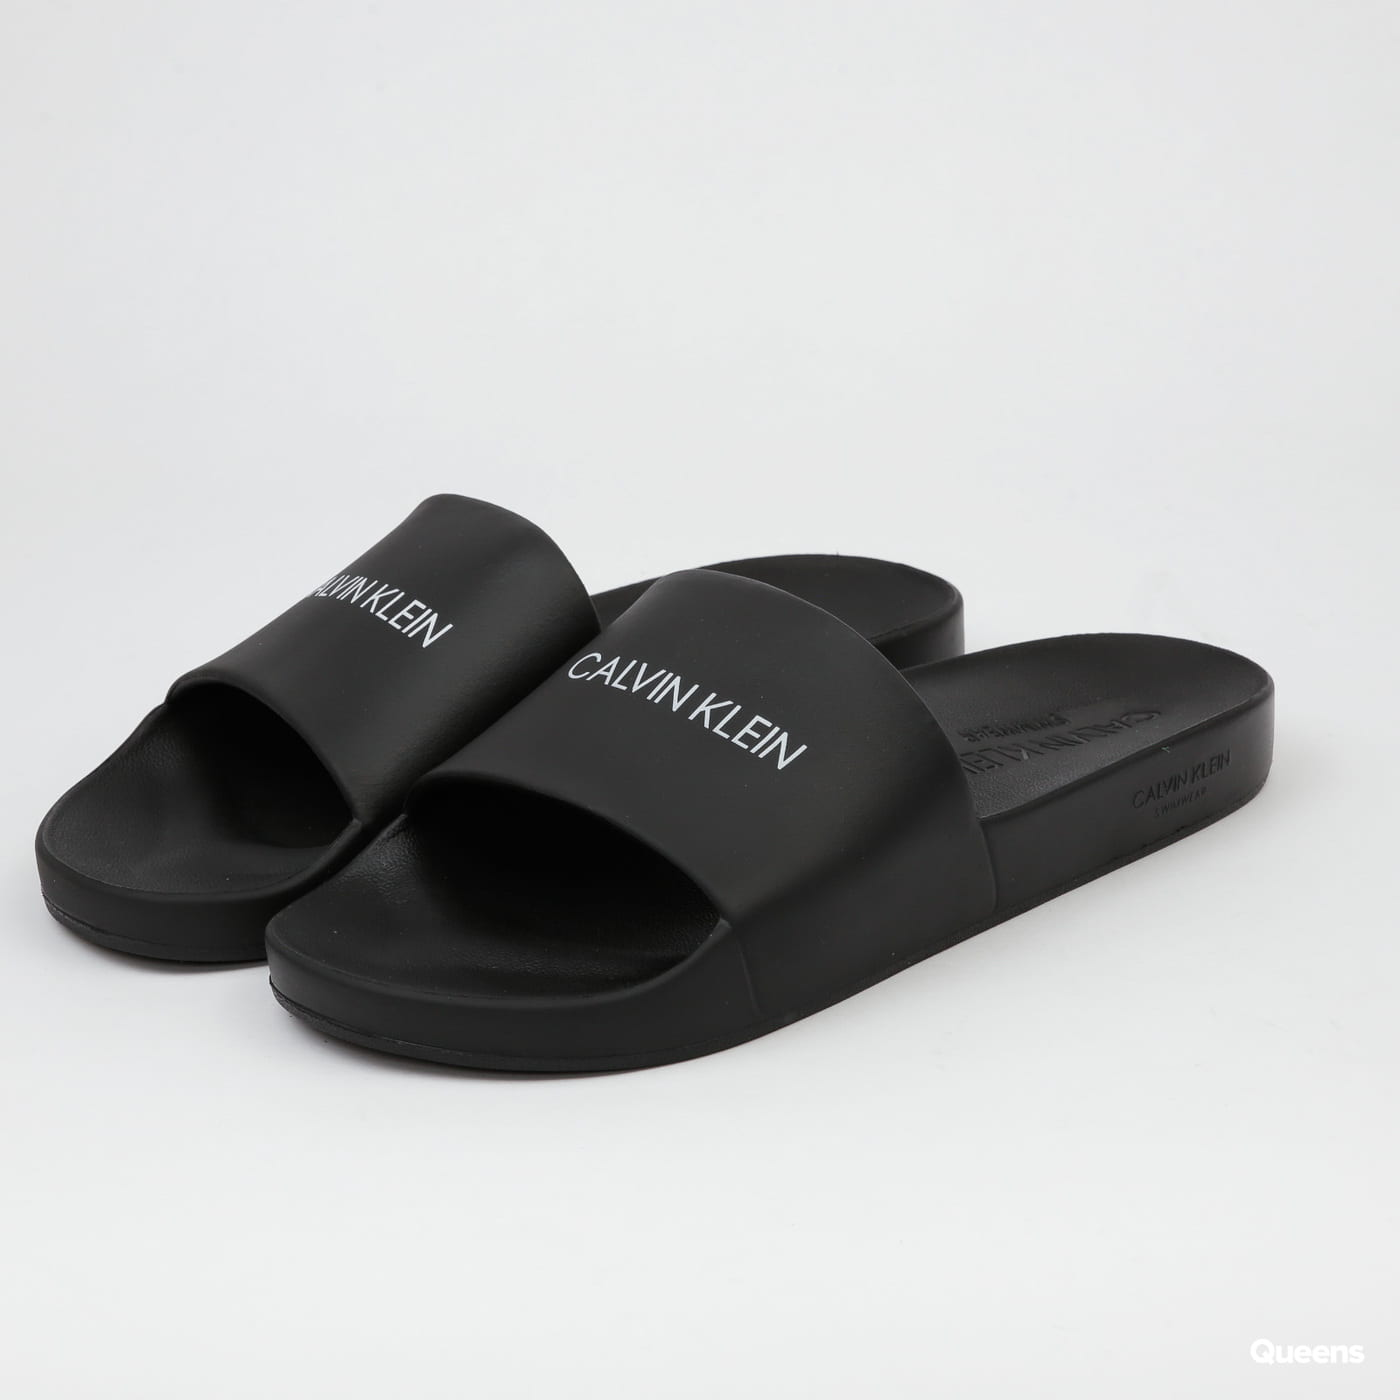 Calvin Klein M One Mold Slide pvh black